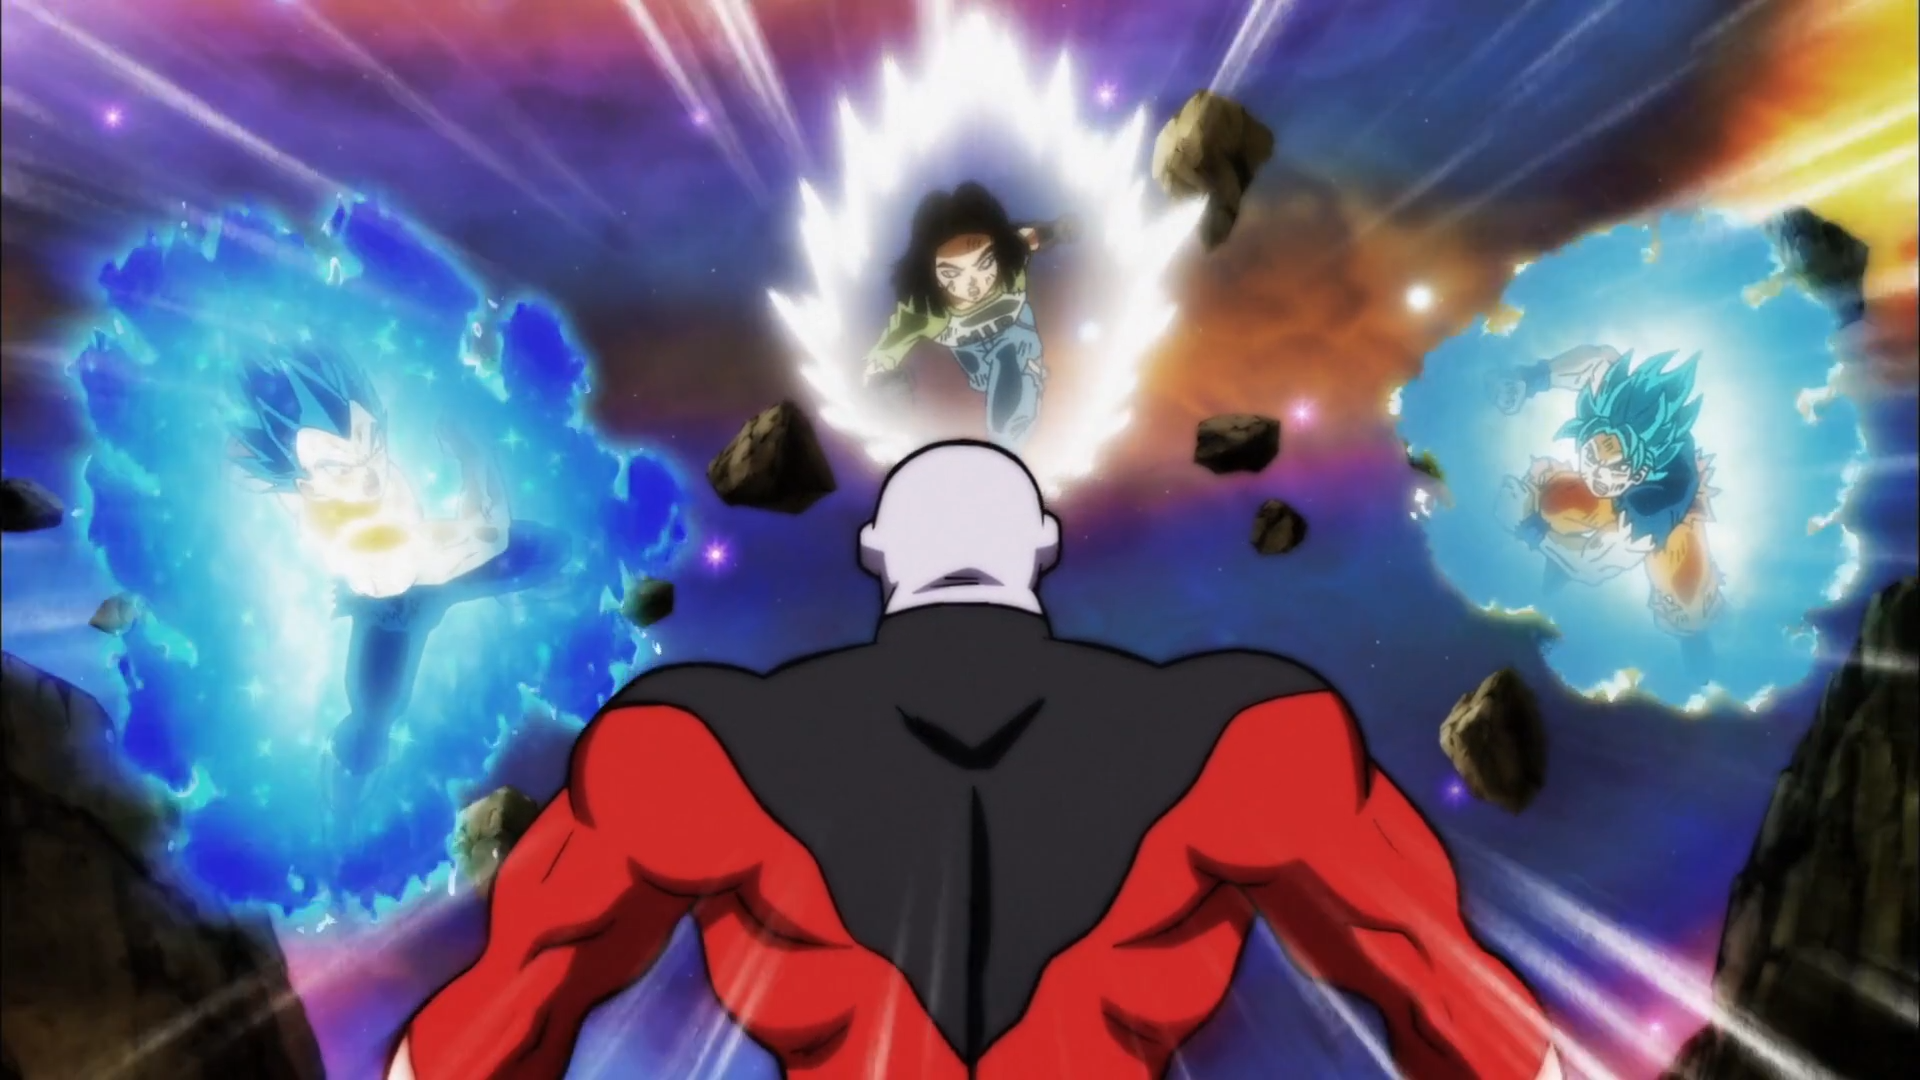 Vegeta C 17 And Son Goku Vs Jiren Fondo De Pantalla Hd